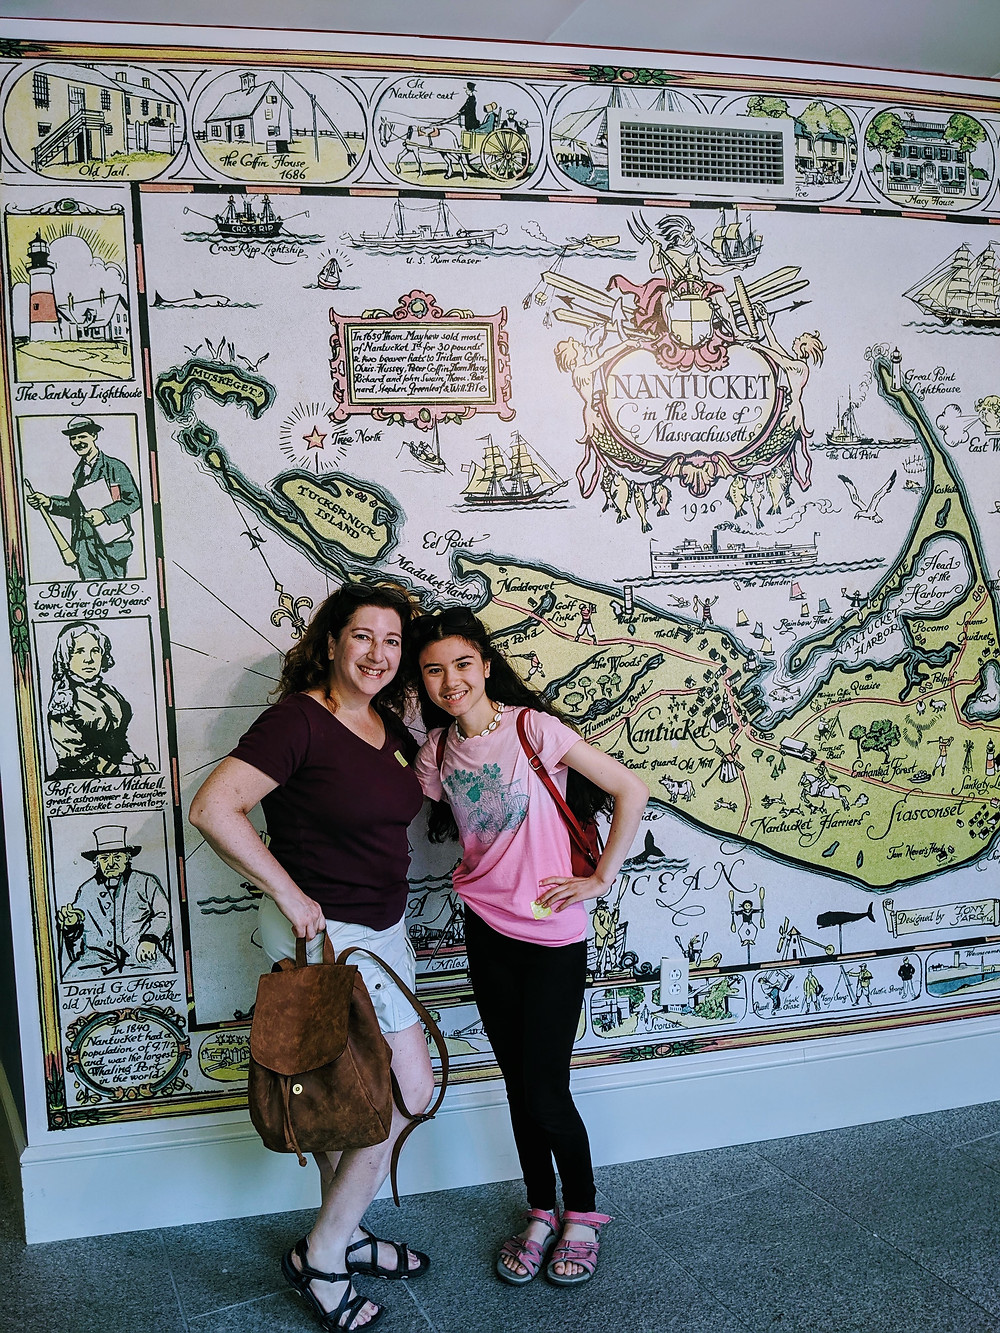 wall-mural-whaling-museum-Nantucket